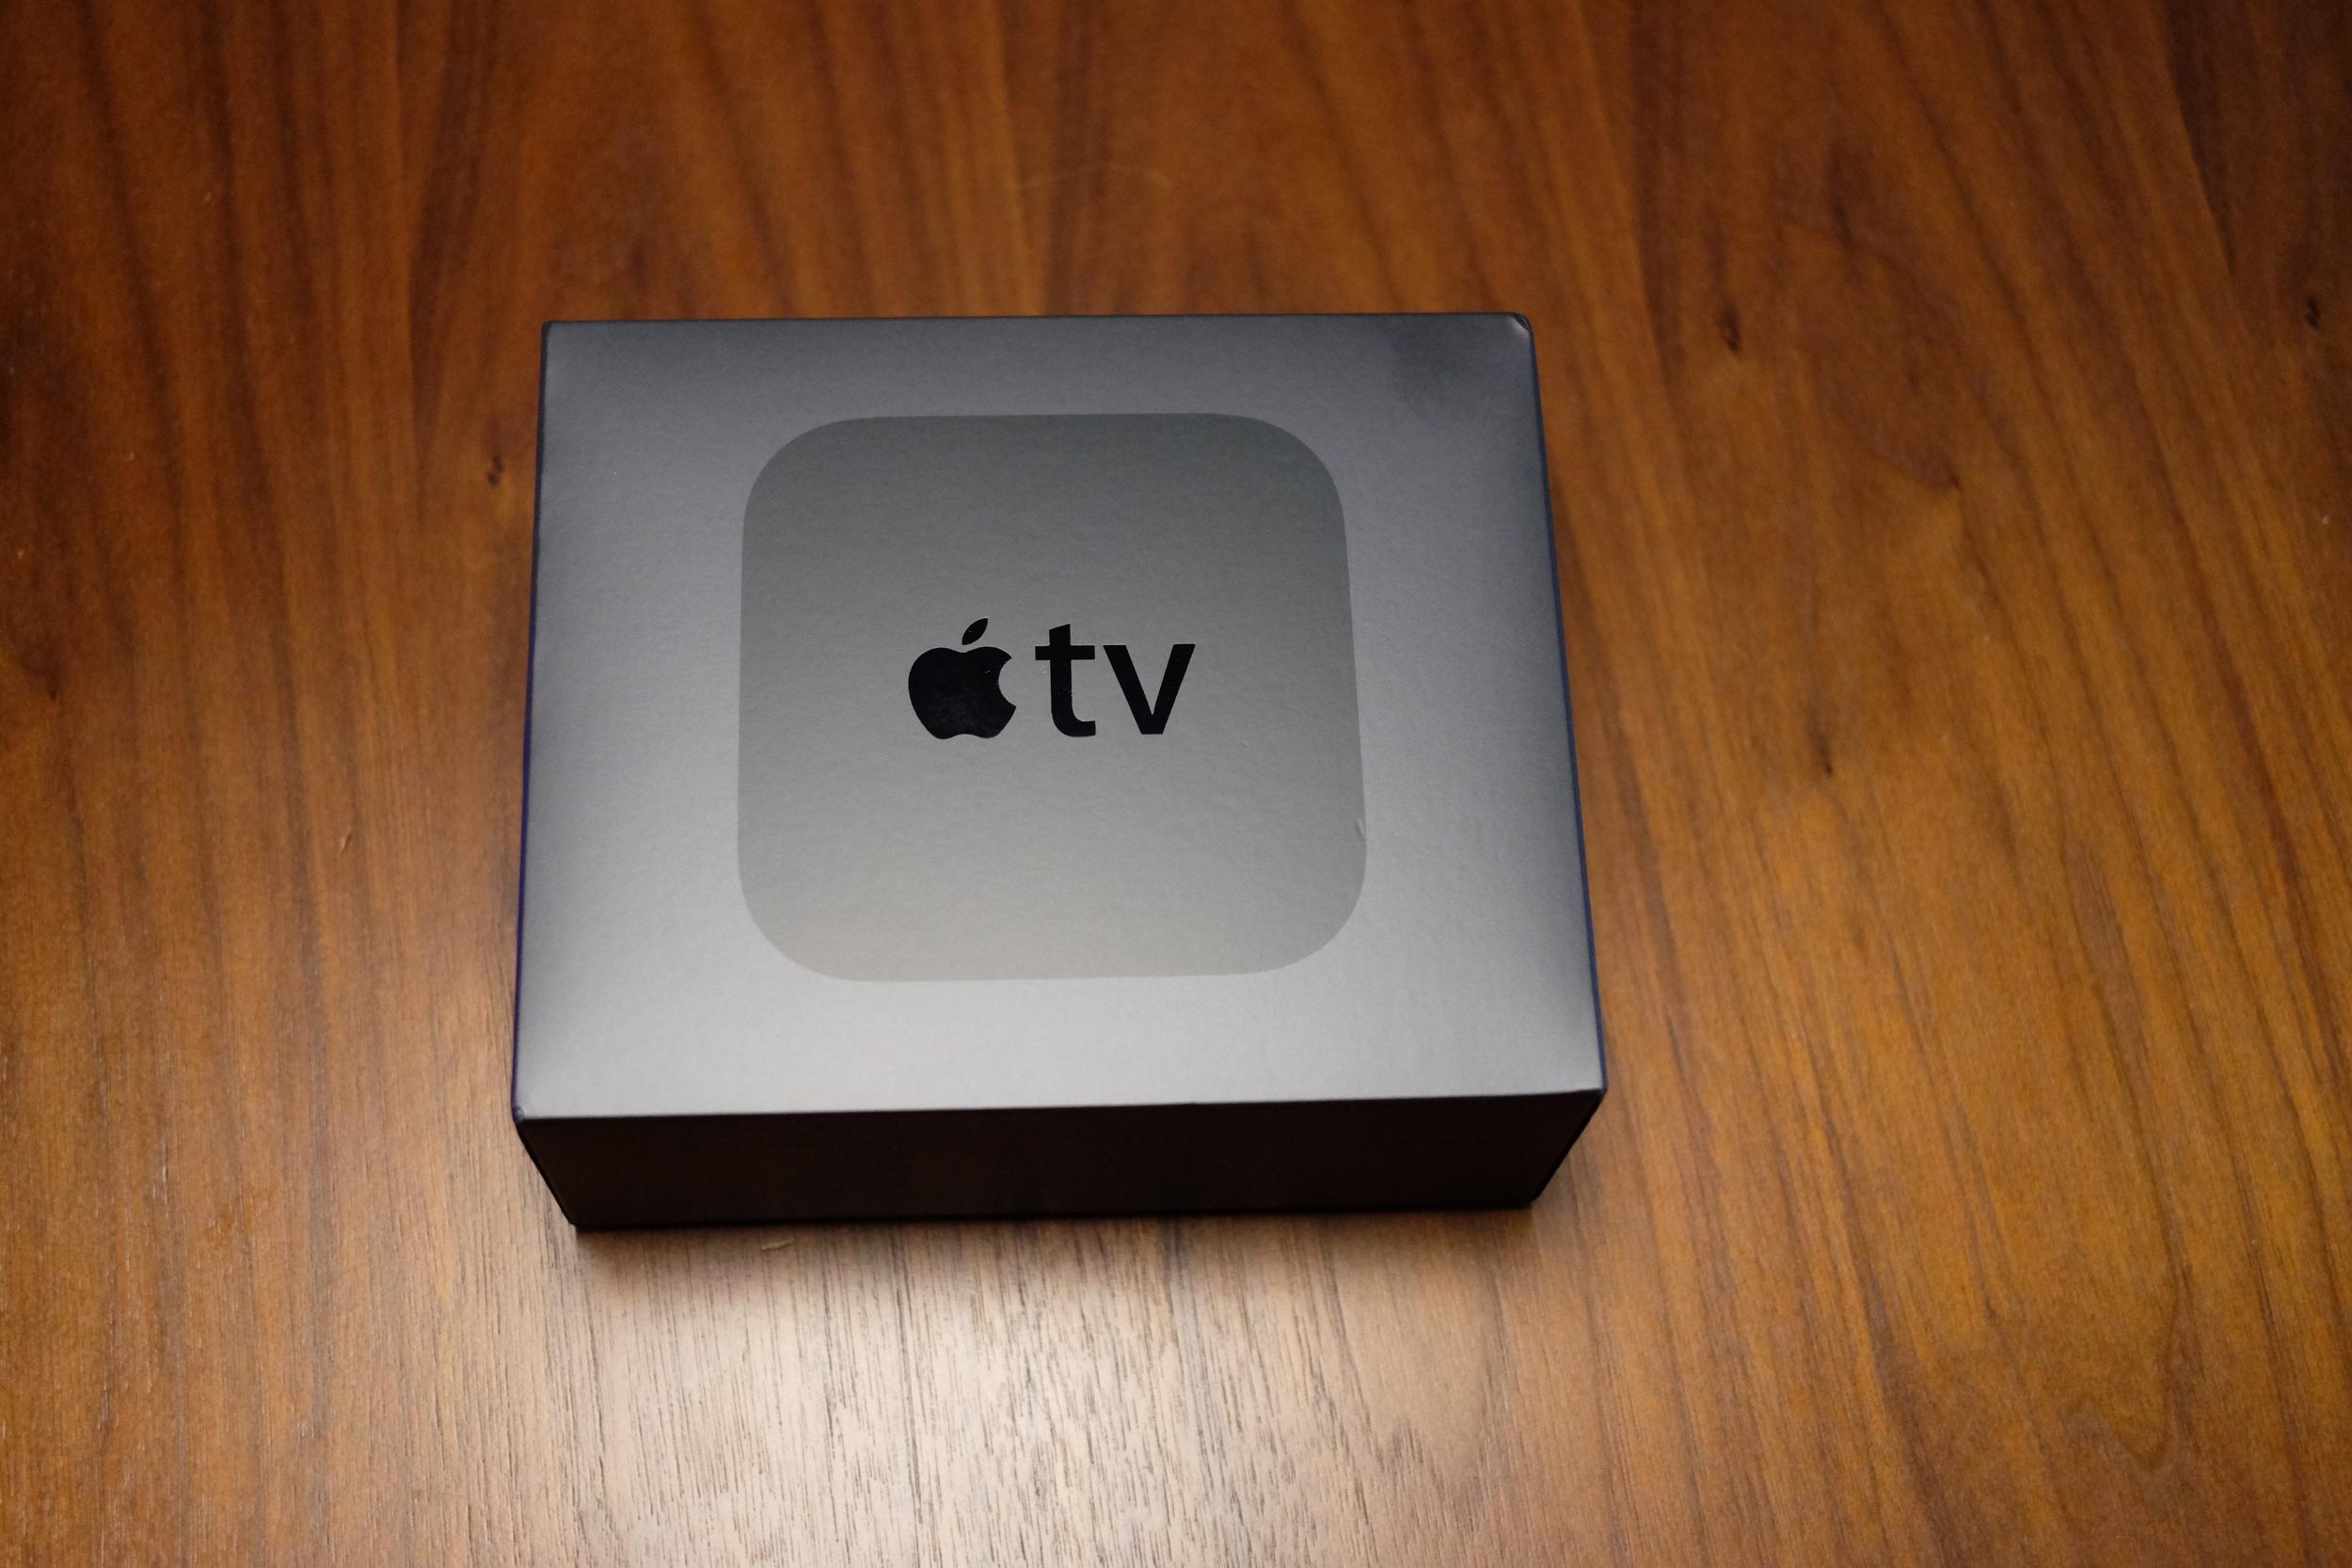 Apple TV packaging - Christmas temptation?